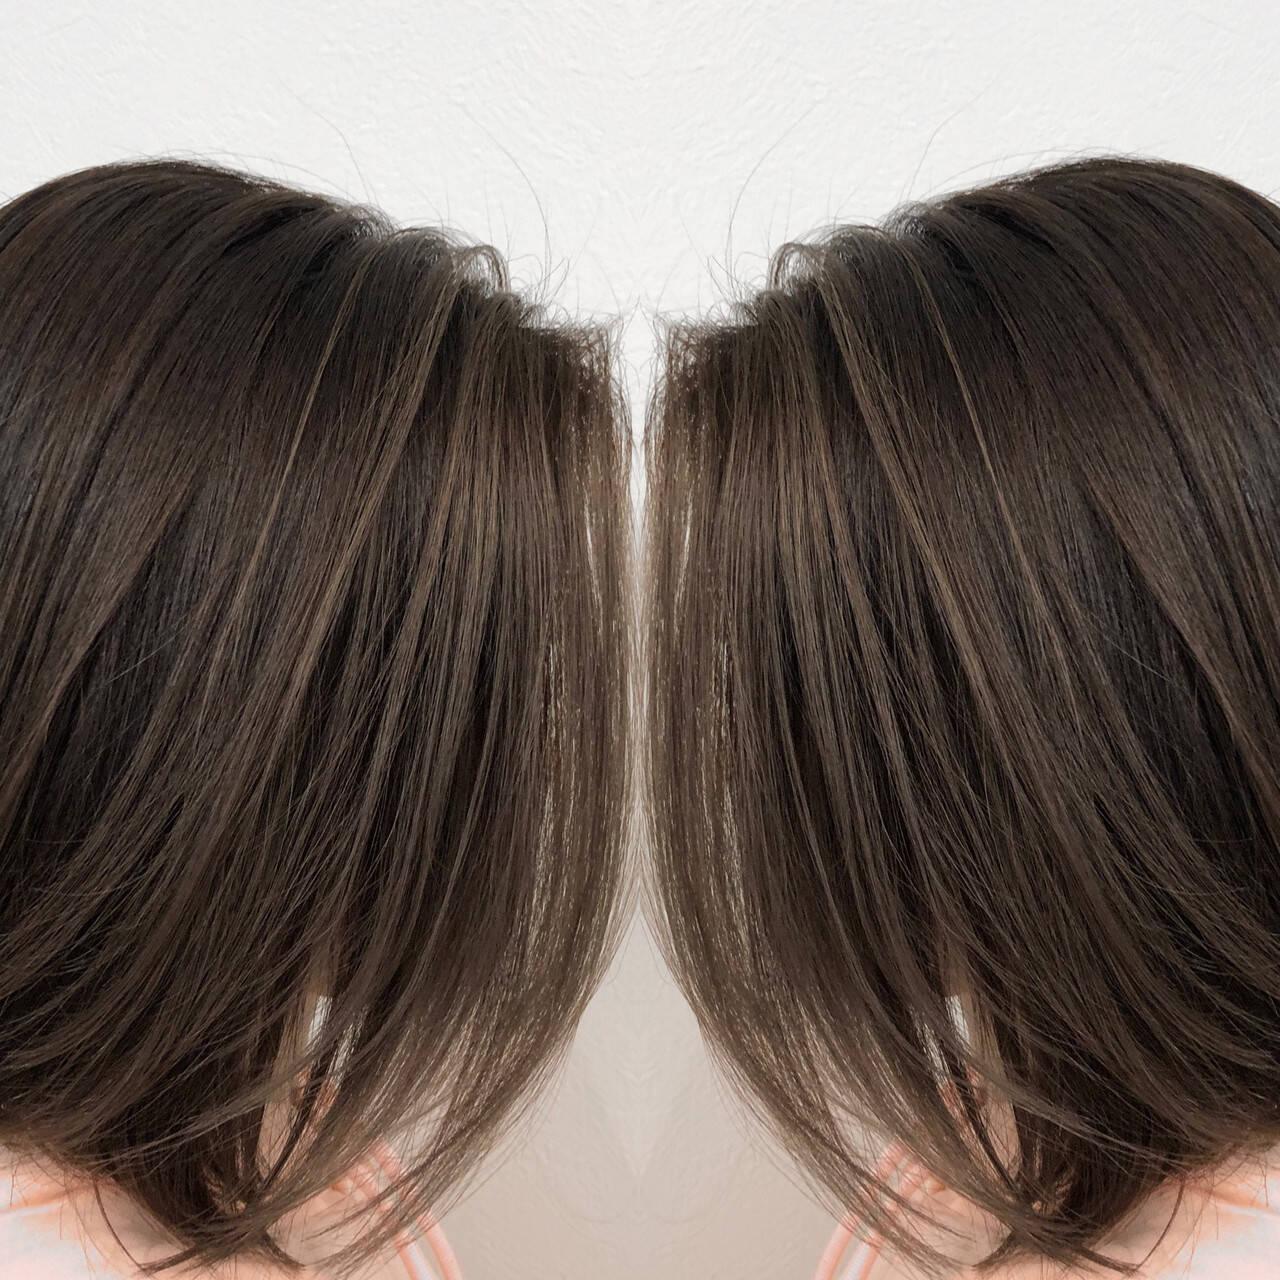 3Dハイライト 外国人風カラー ショートヘア バレイヤージュヘアスタイルや髪型の写真・画像